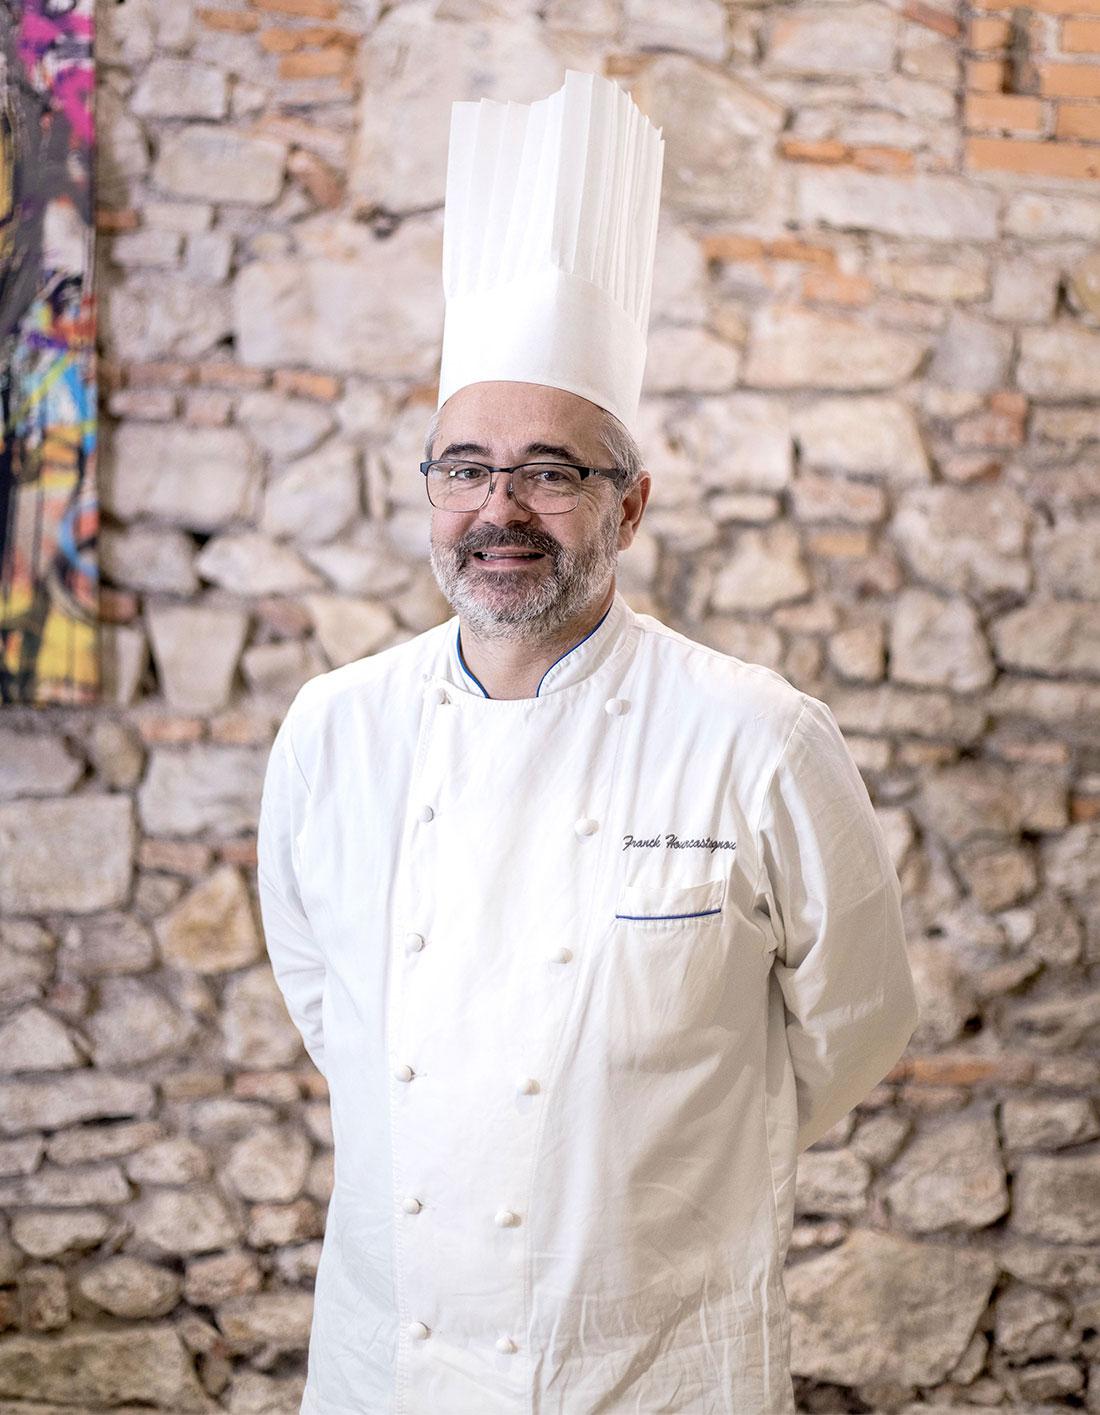 Photo du Chef Franck Hourcastagnou